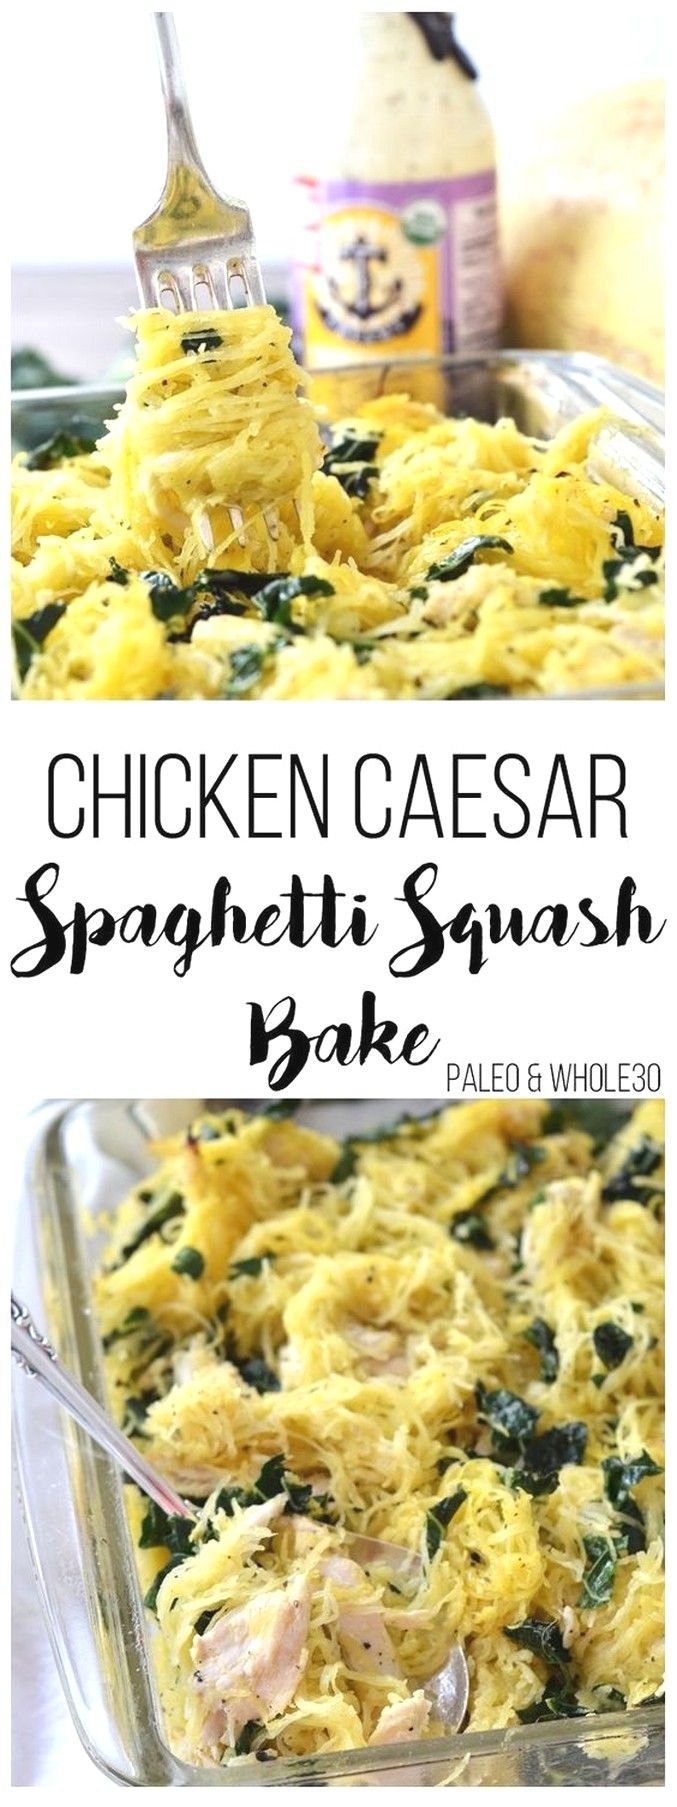 Chicken Caesar Spaghetti Squash Bake | Clean Eating Recipes #cleaneatingforbeginners